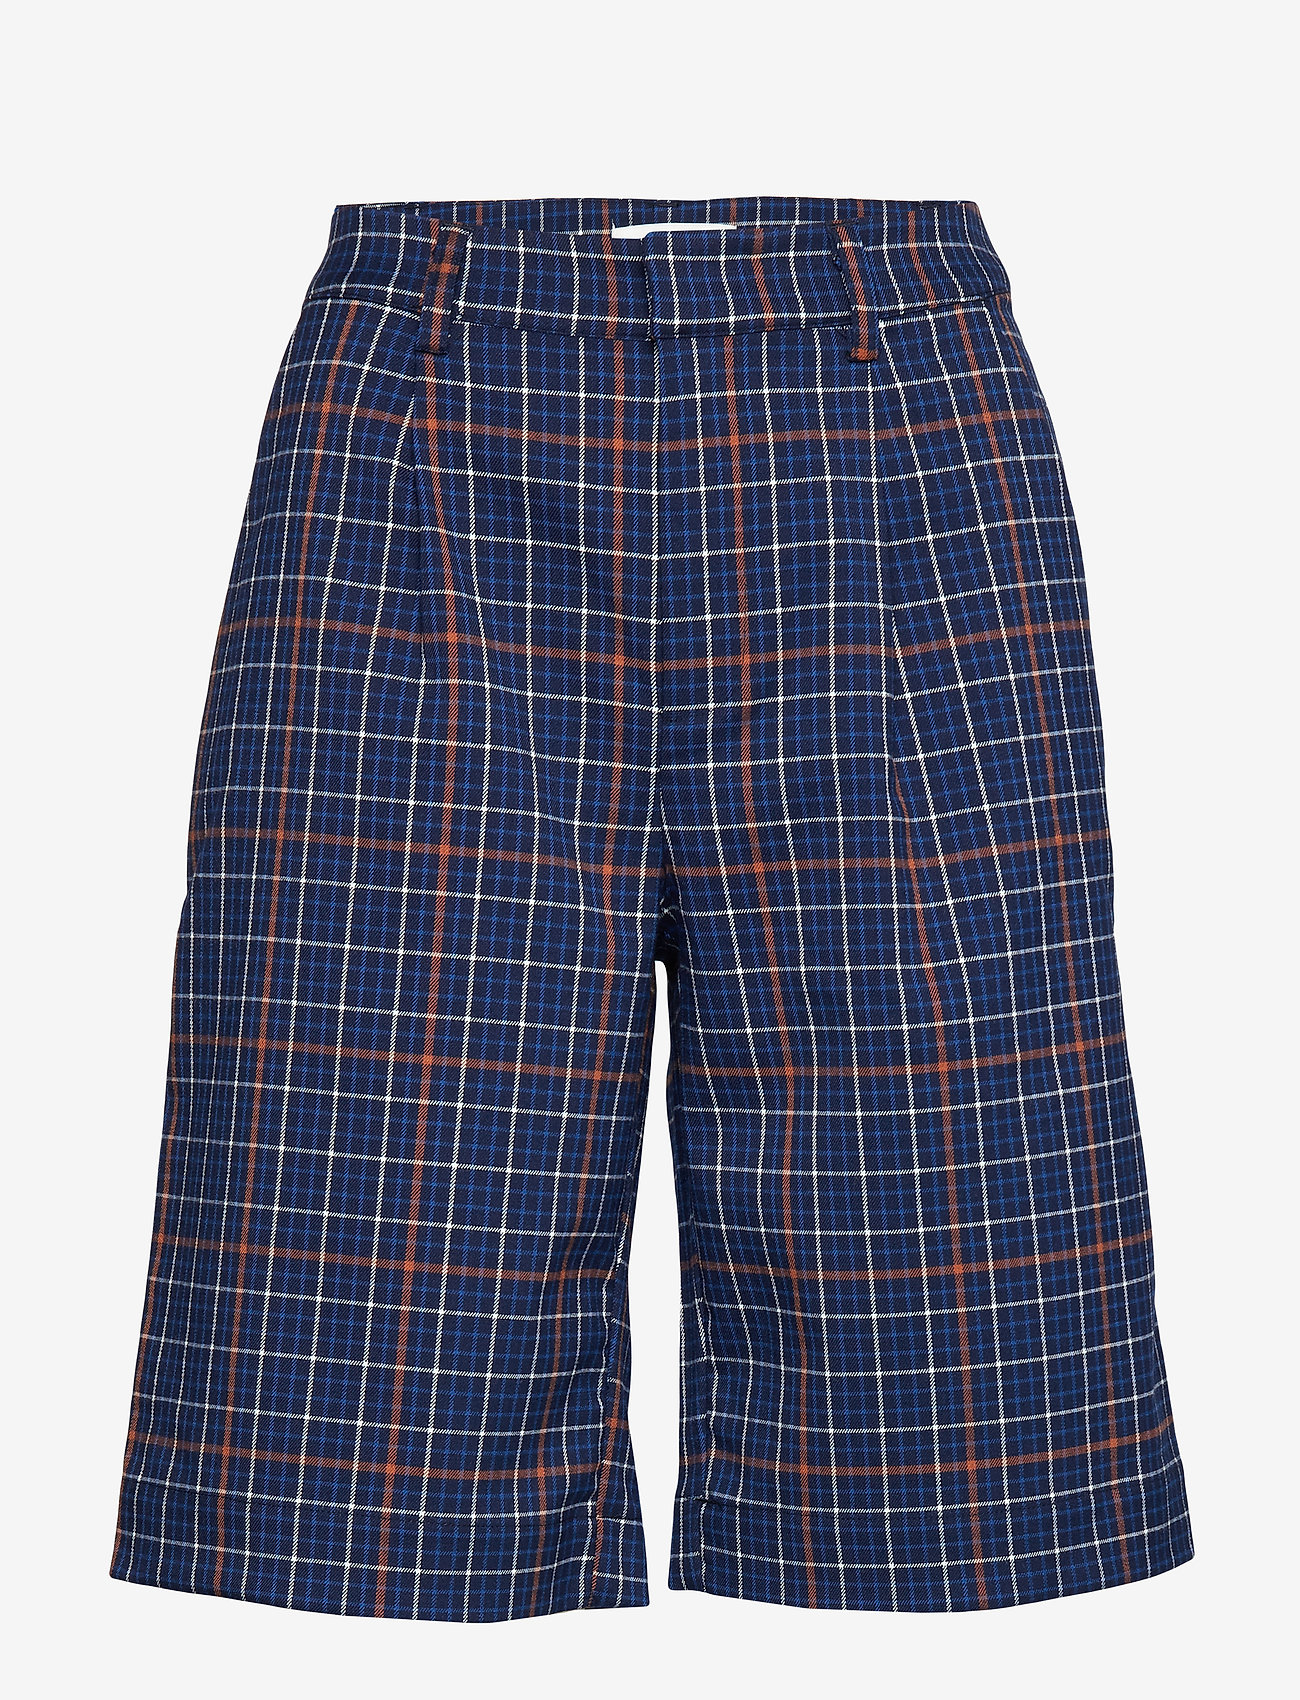 Gestuz - NiraGZ shorts MA19 - bermuda-shortsit - blue/umber check